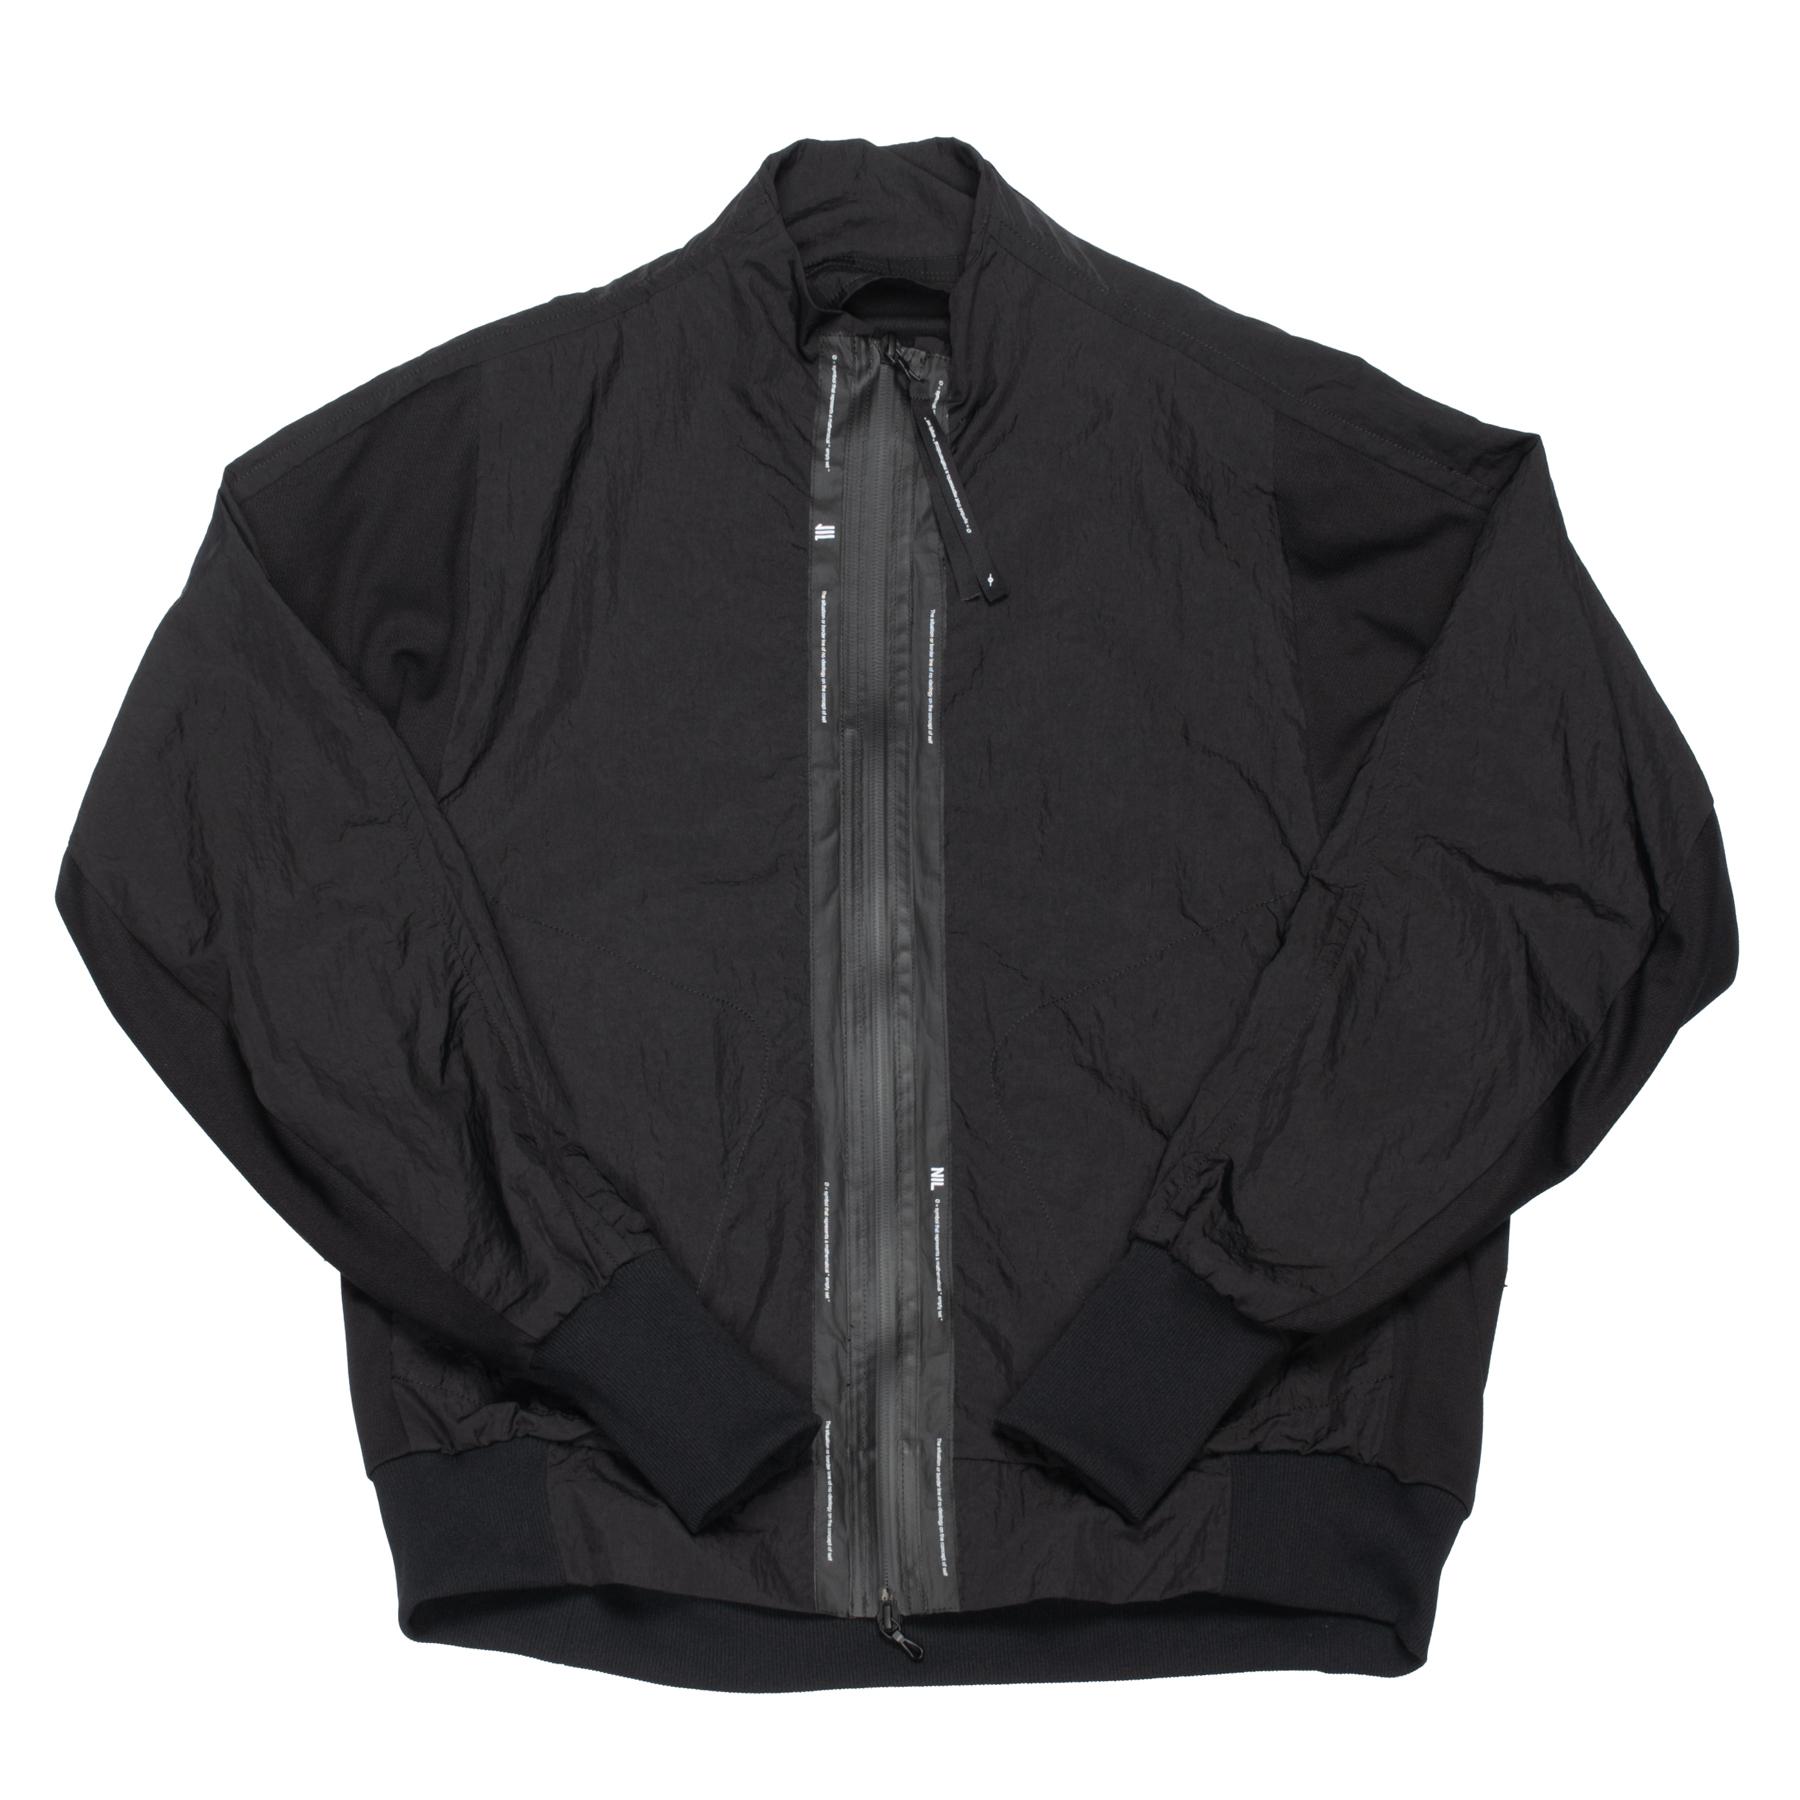 640BLM1-BLACK / コンビーネーションジャケット